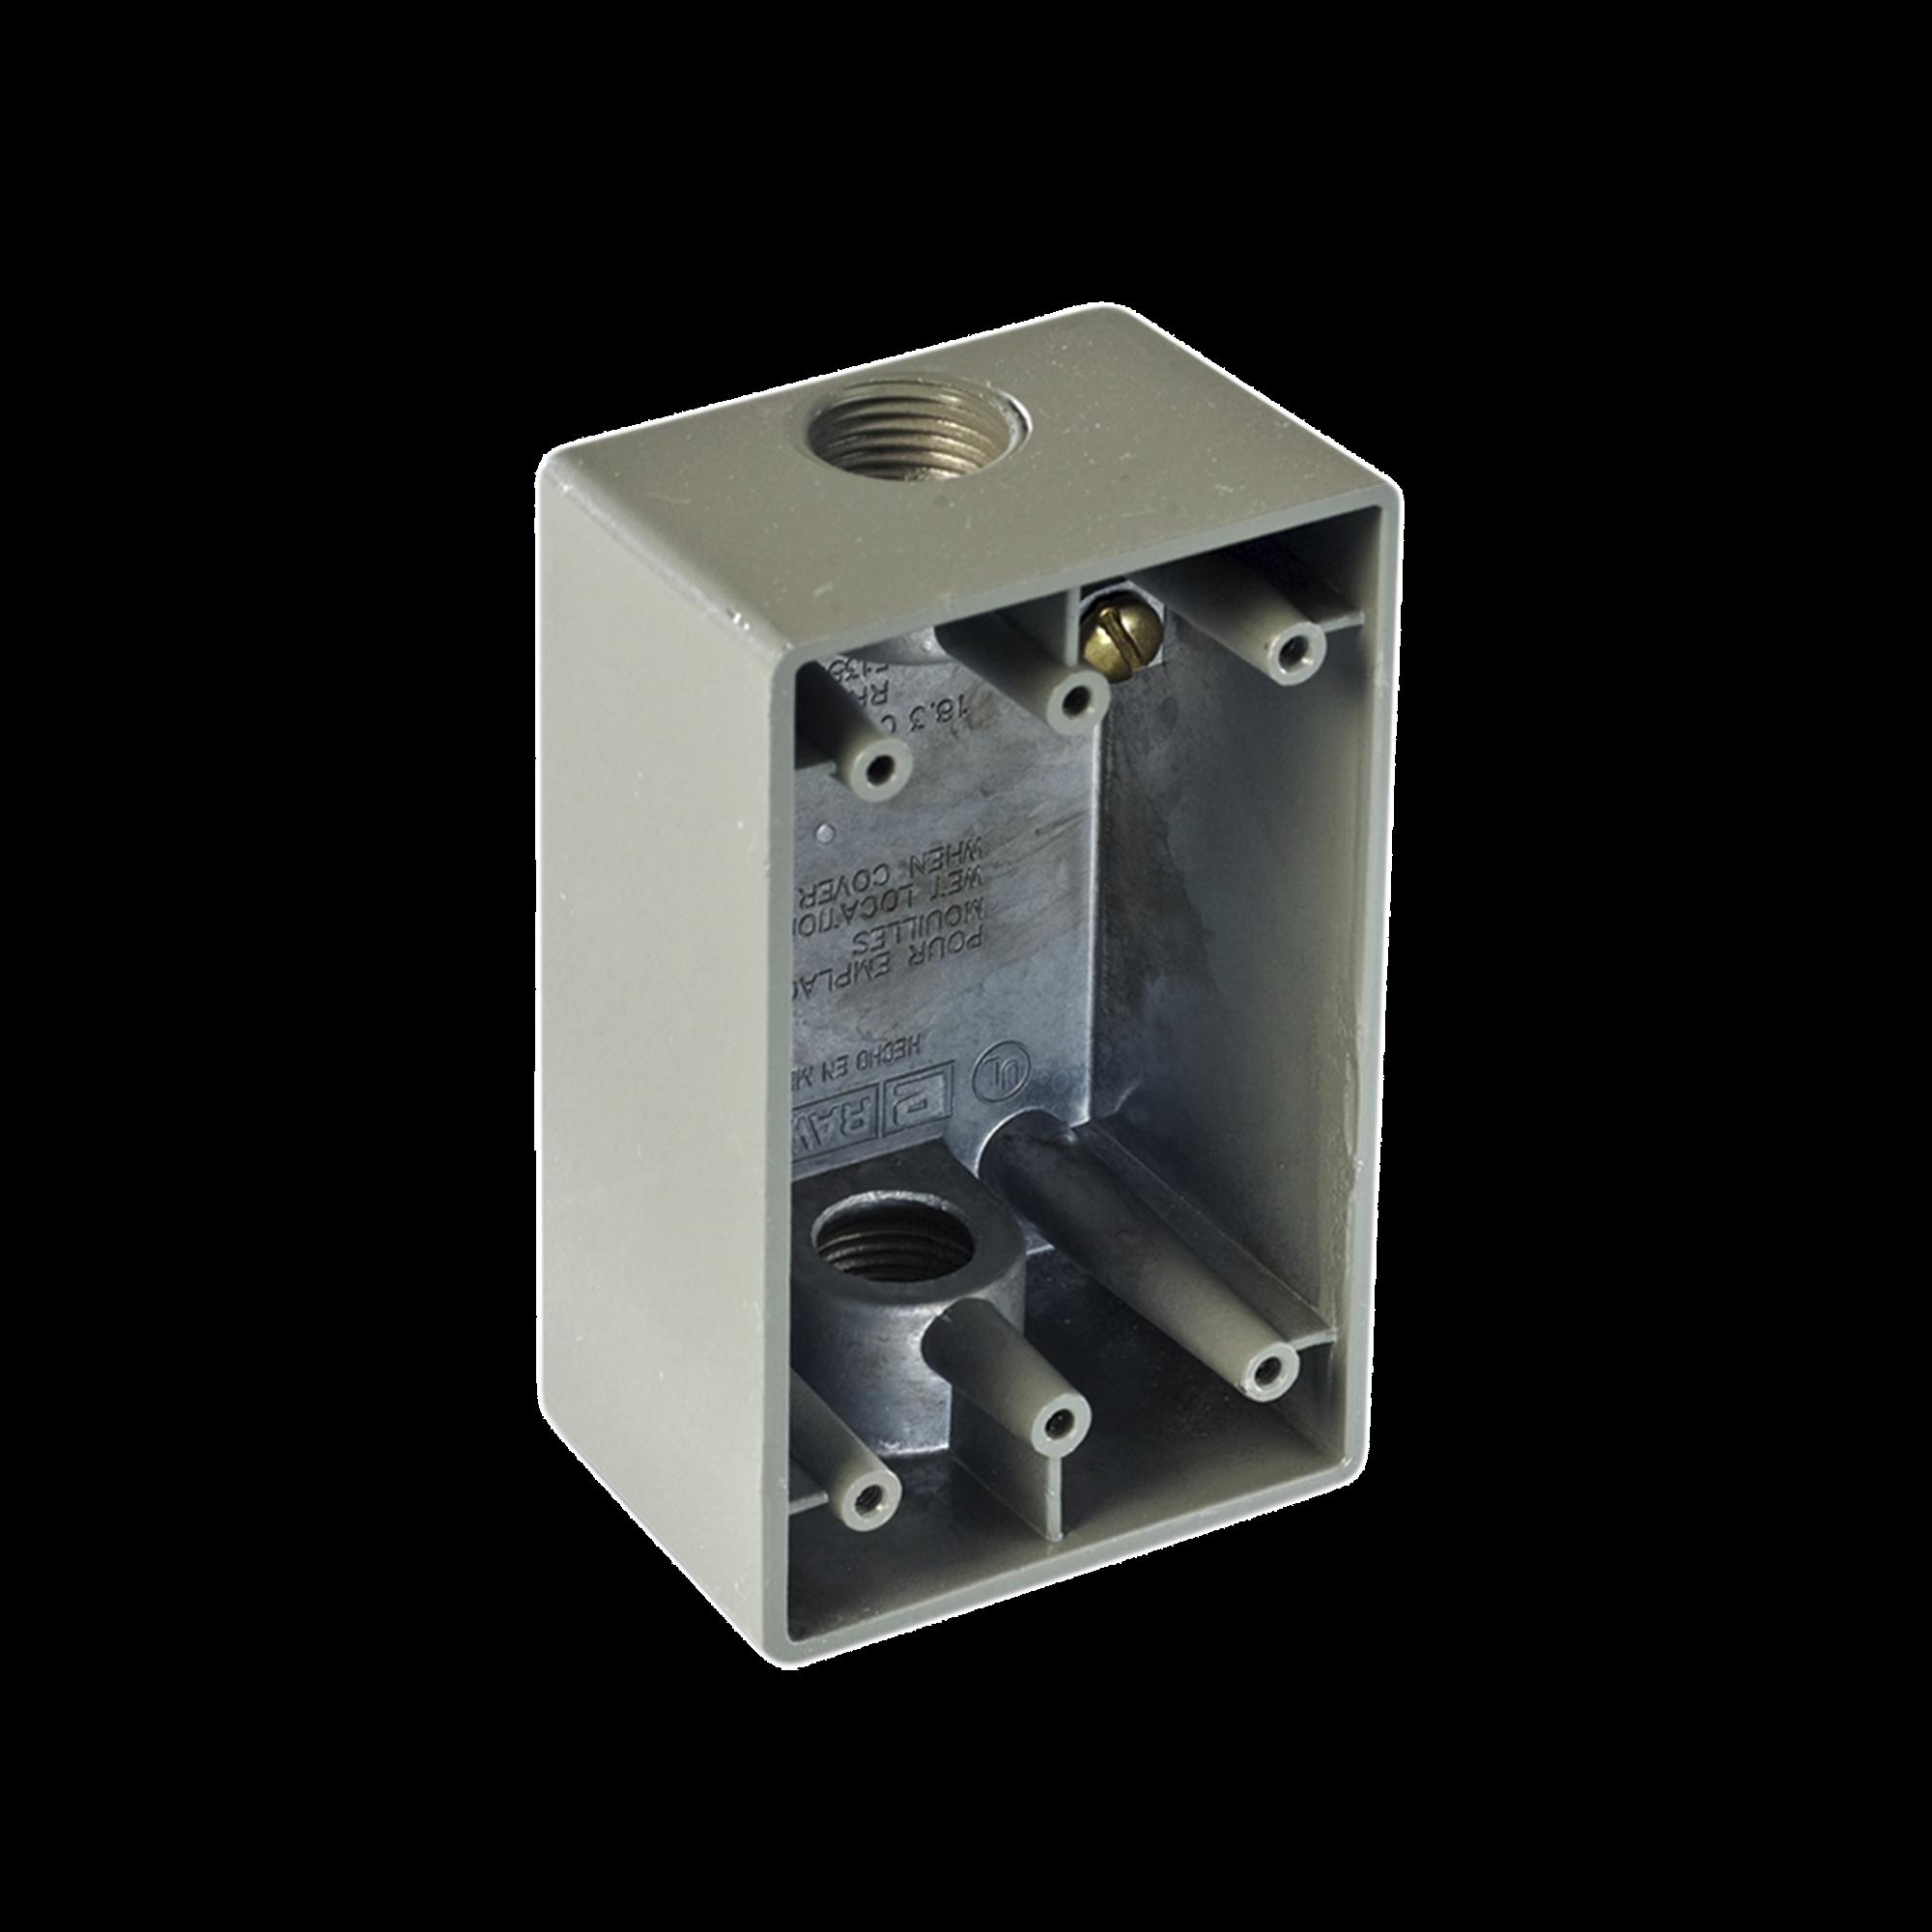 Caja Condulet FS de 3/4 (19.05 mm) con dos bocas a prueba de intemperie.